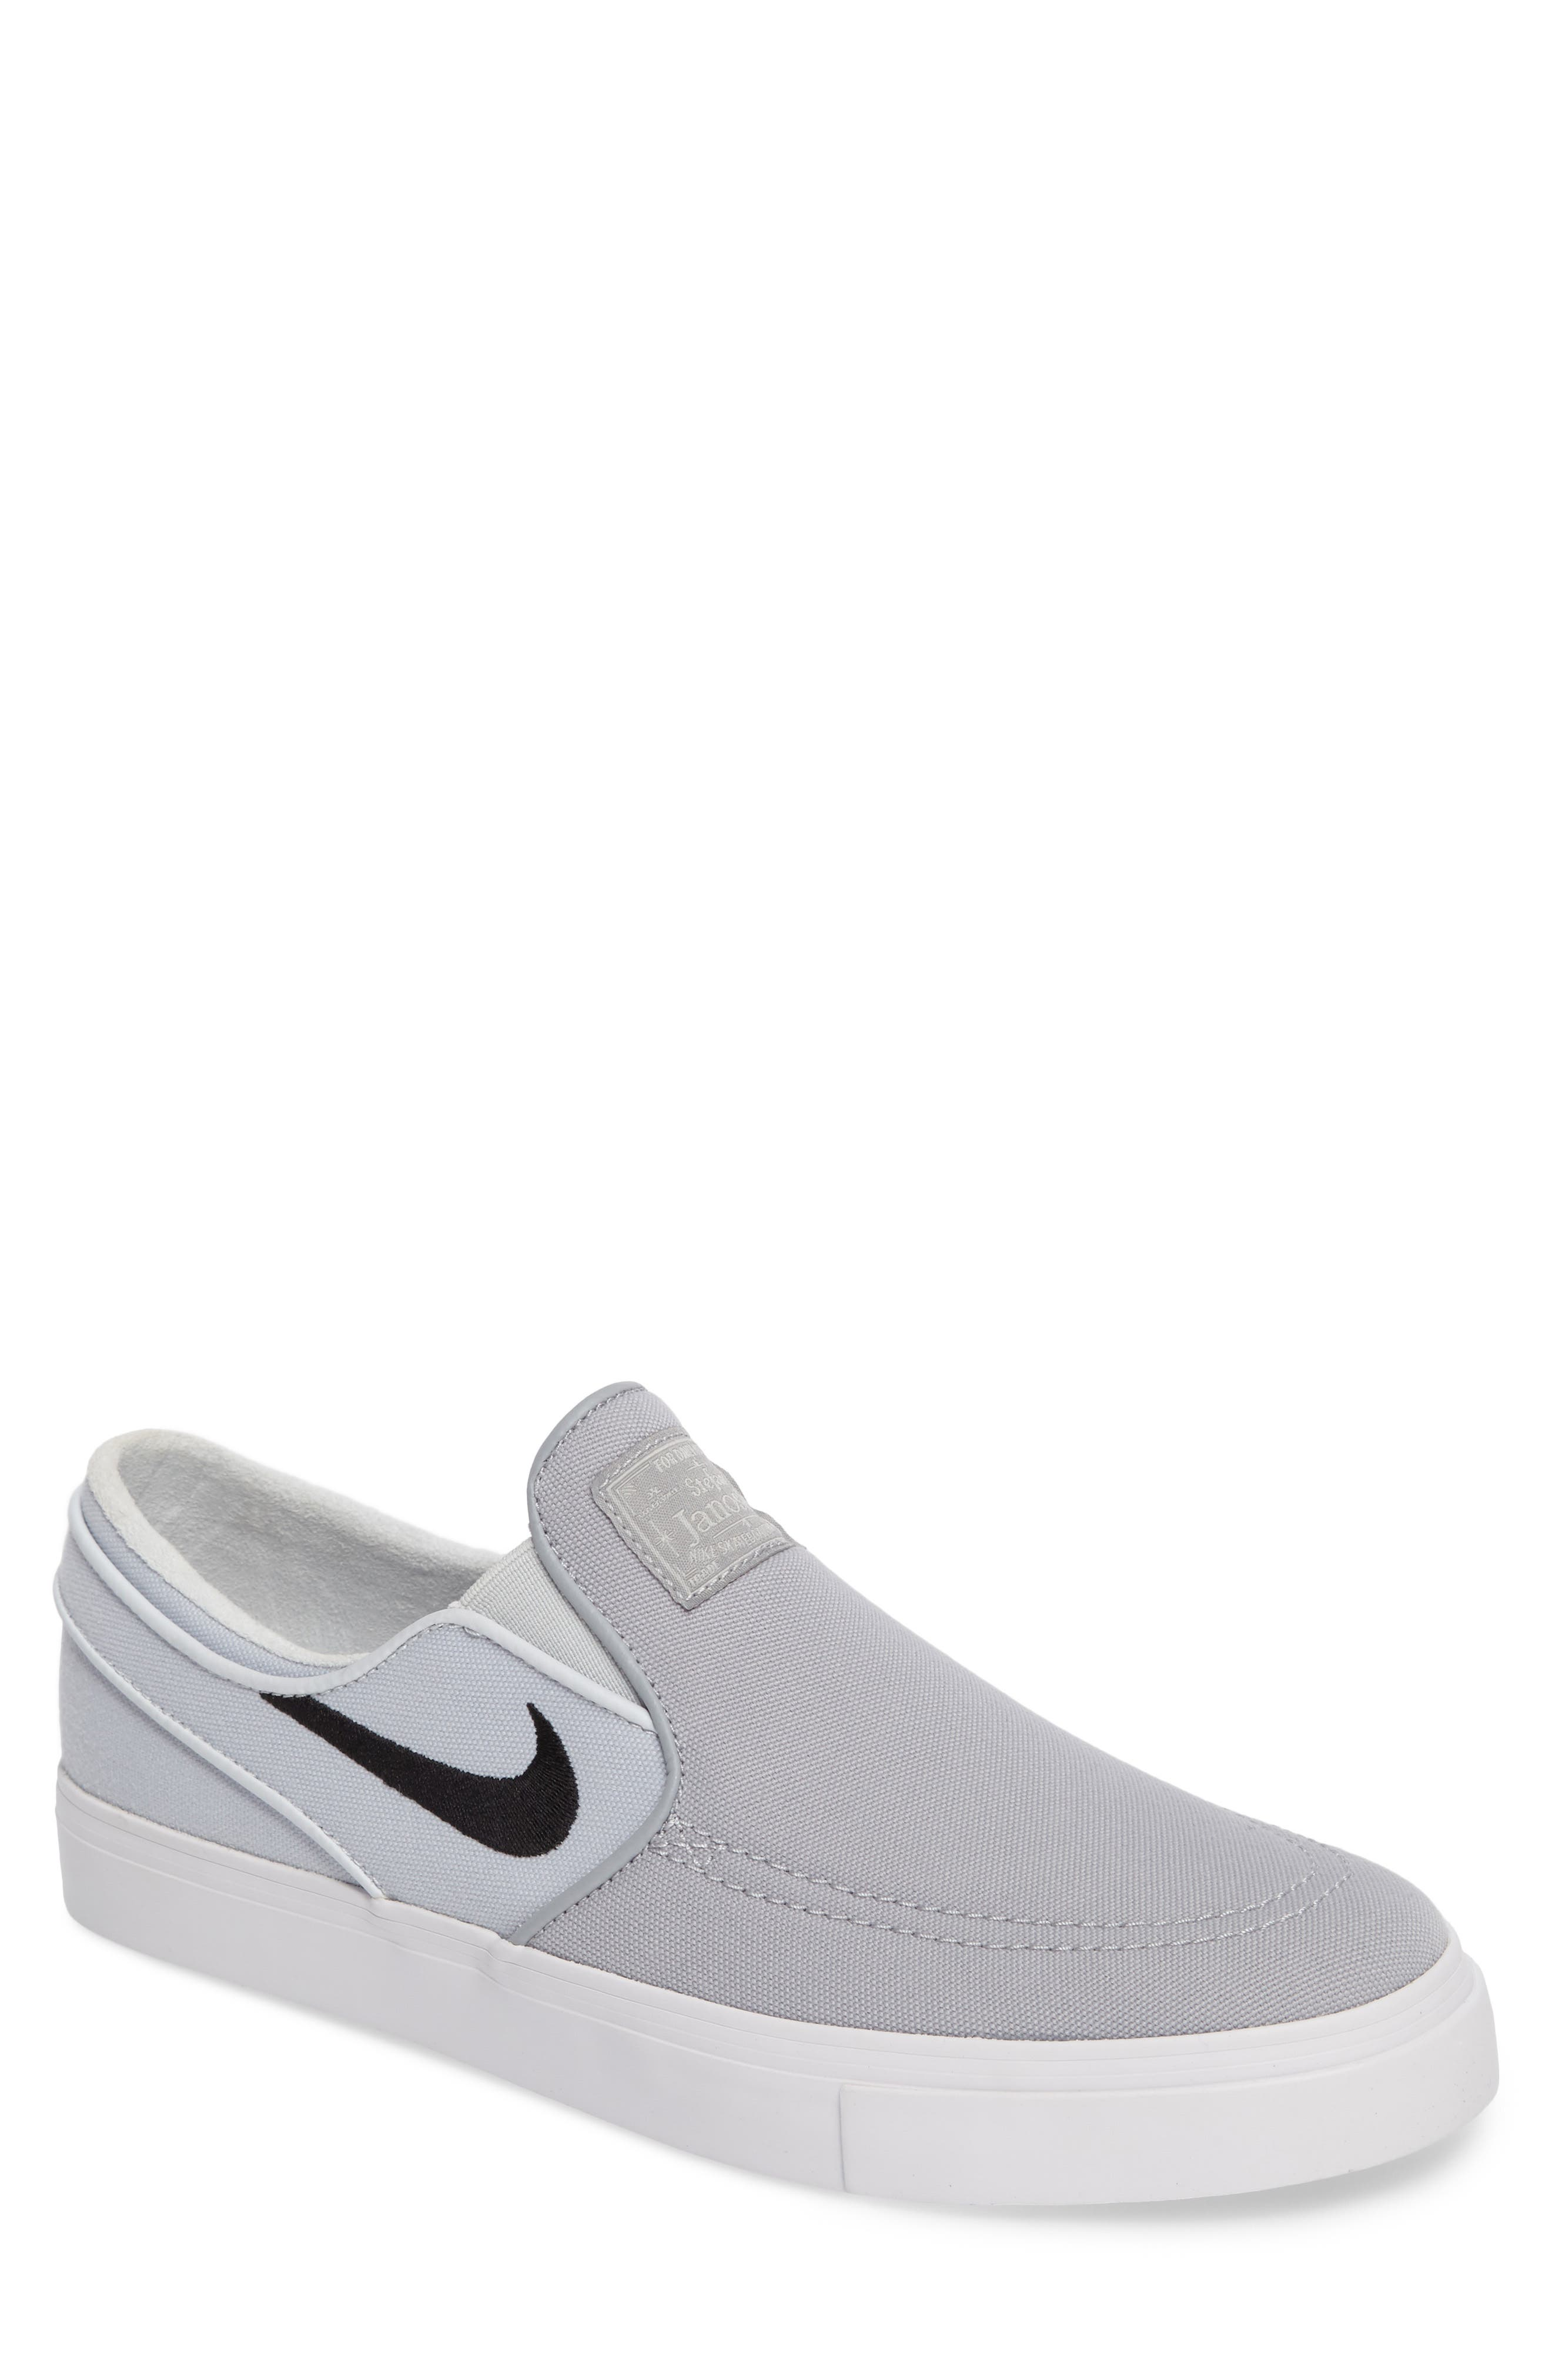 Alternate Image 1 Selected - Nike 'Zoom Stefan Janoski' Slip-On (Men)